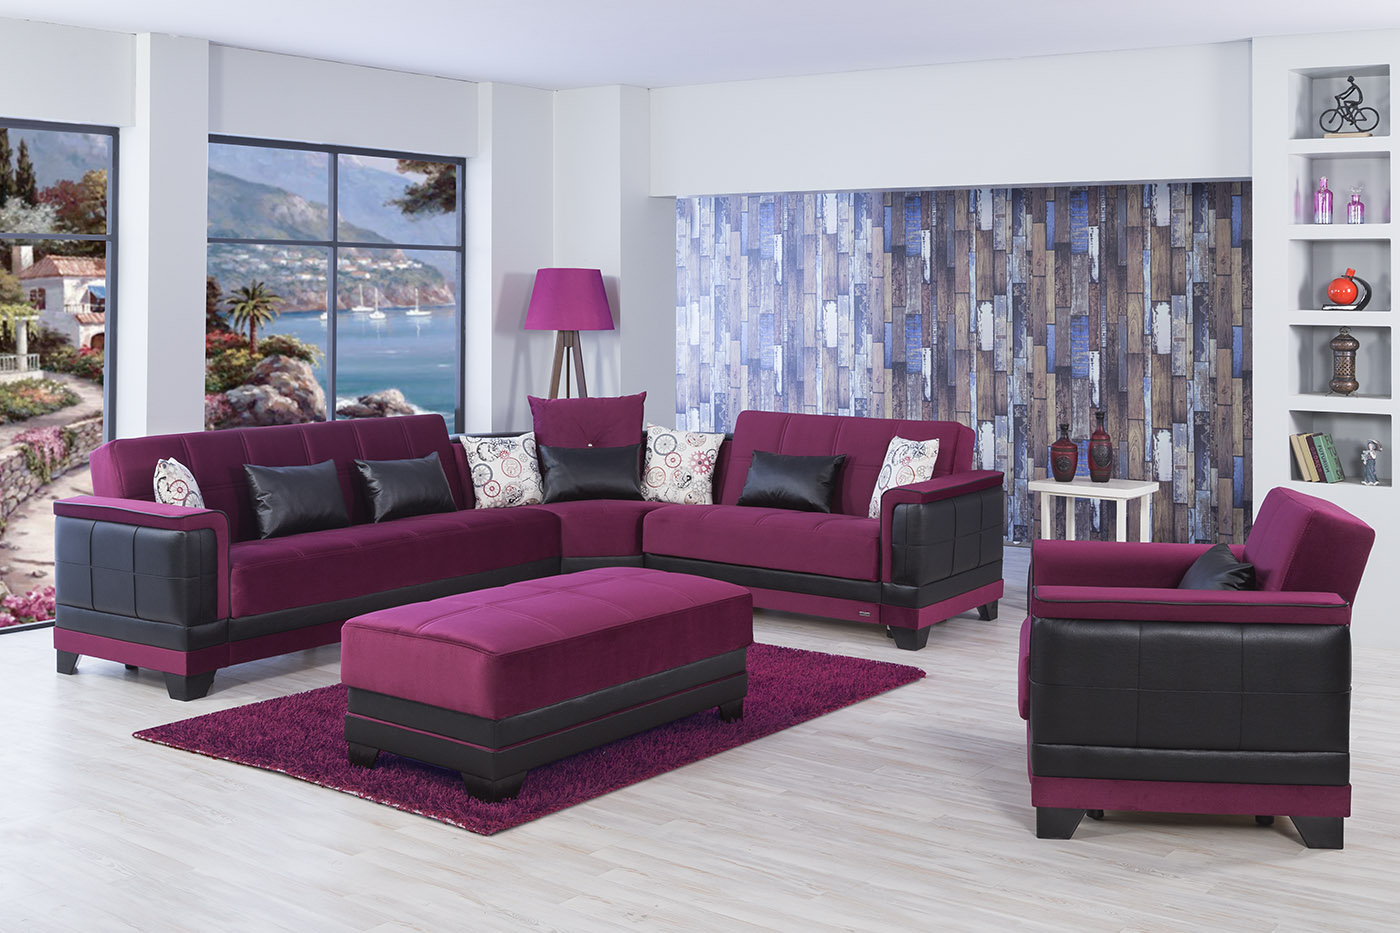 Four Seasons Eva Burgundy Sectional Sofa By Casamode